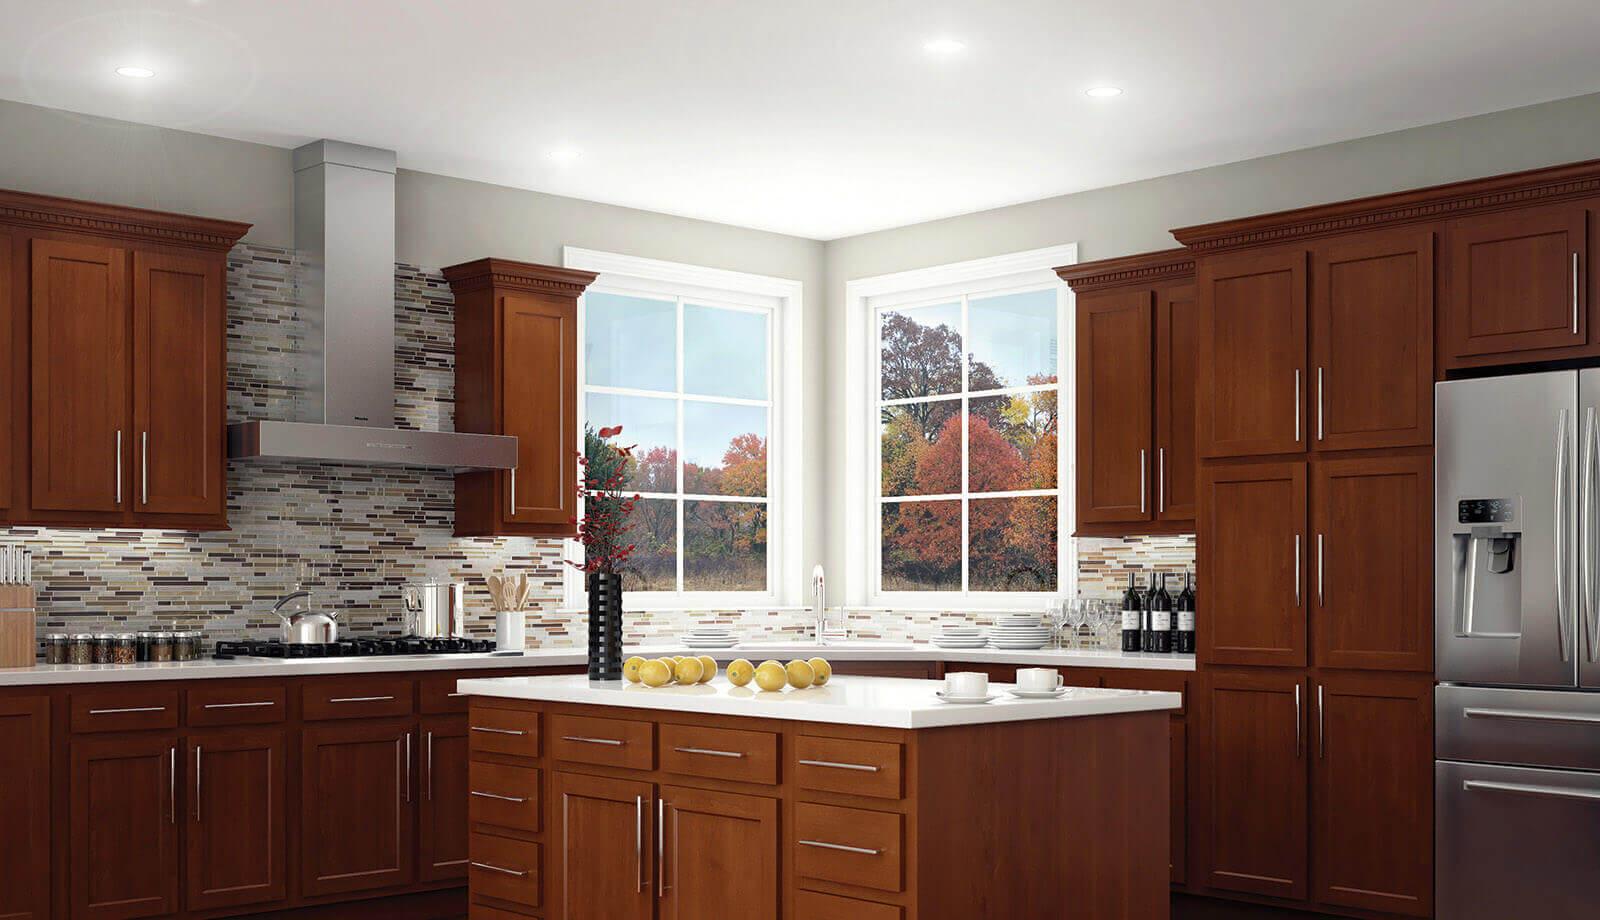 Home - Viking Kitchen Cabinets